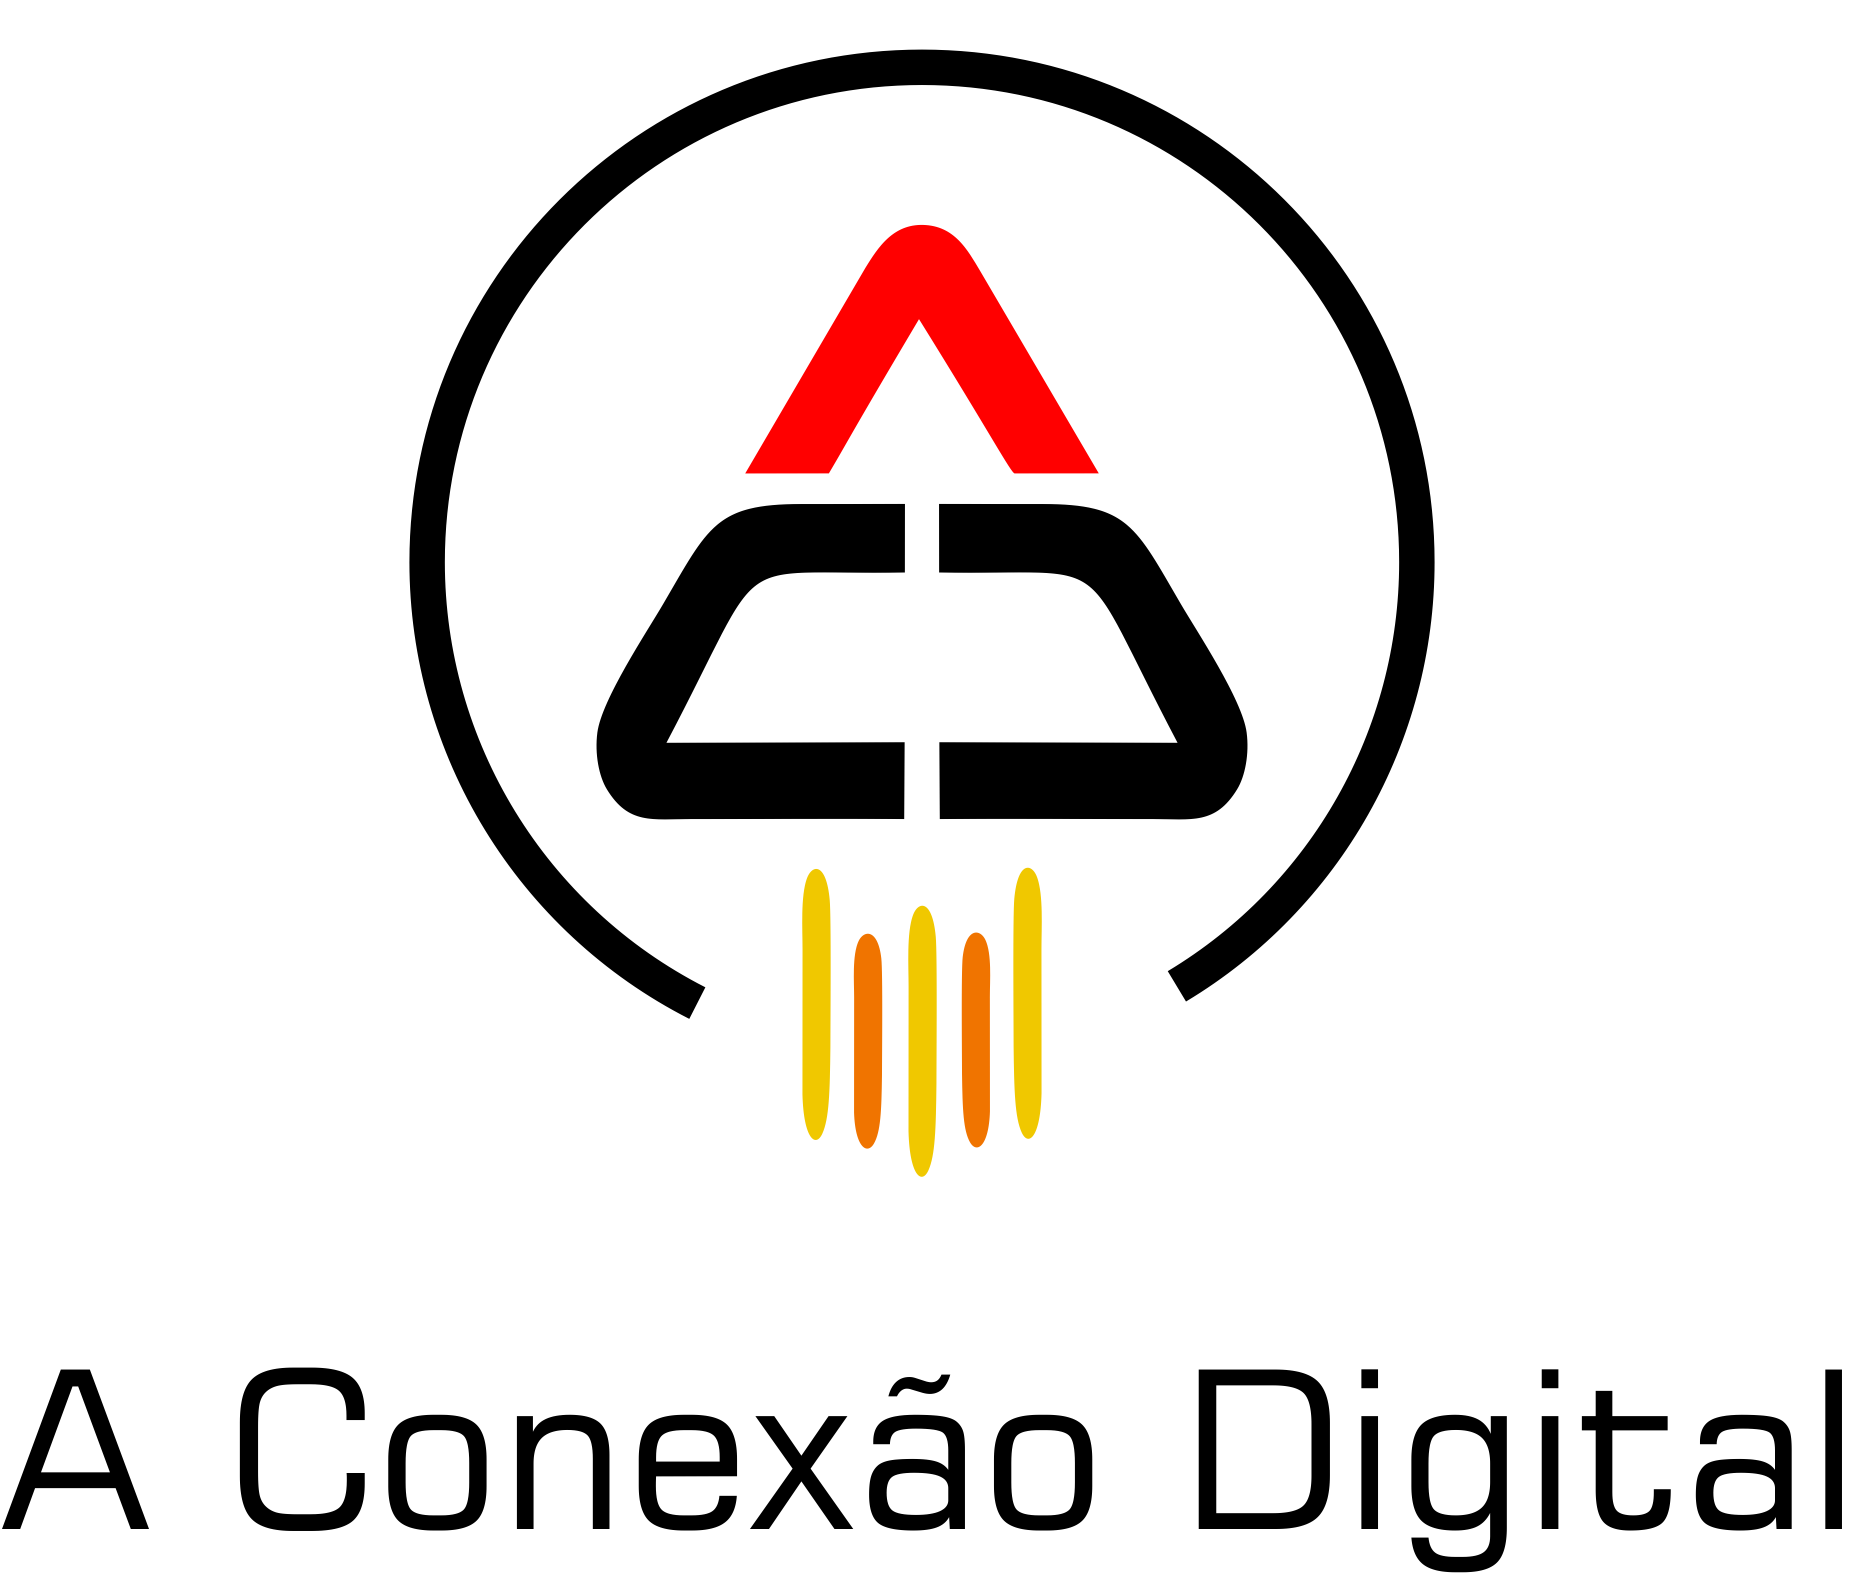 cropped-LOGO-A-CONEXAO-DIGITAL-1.png